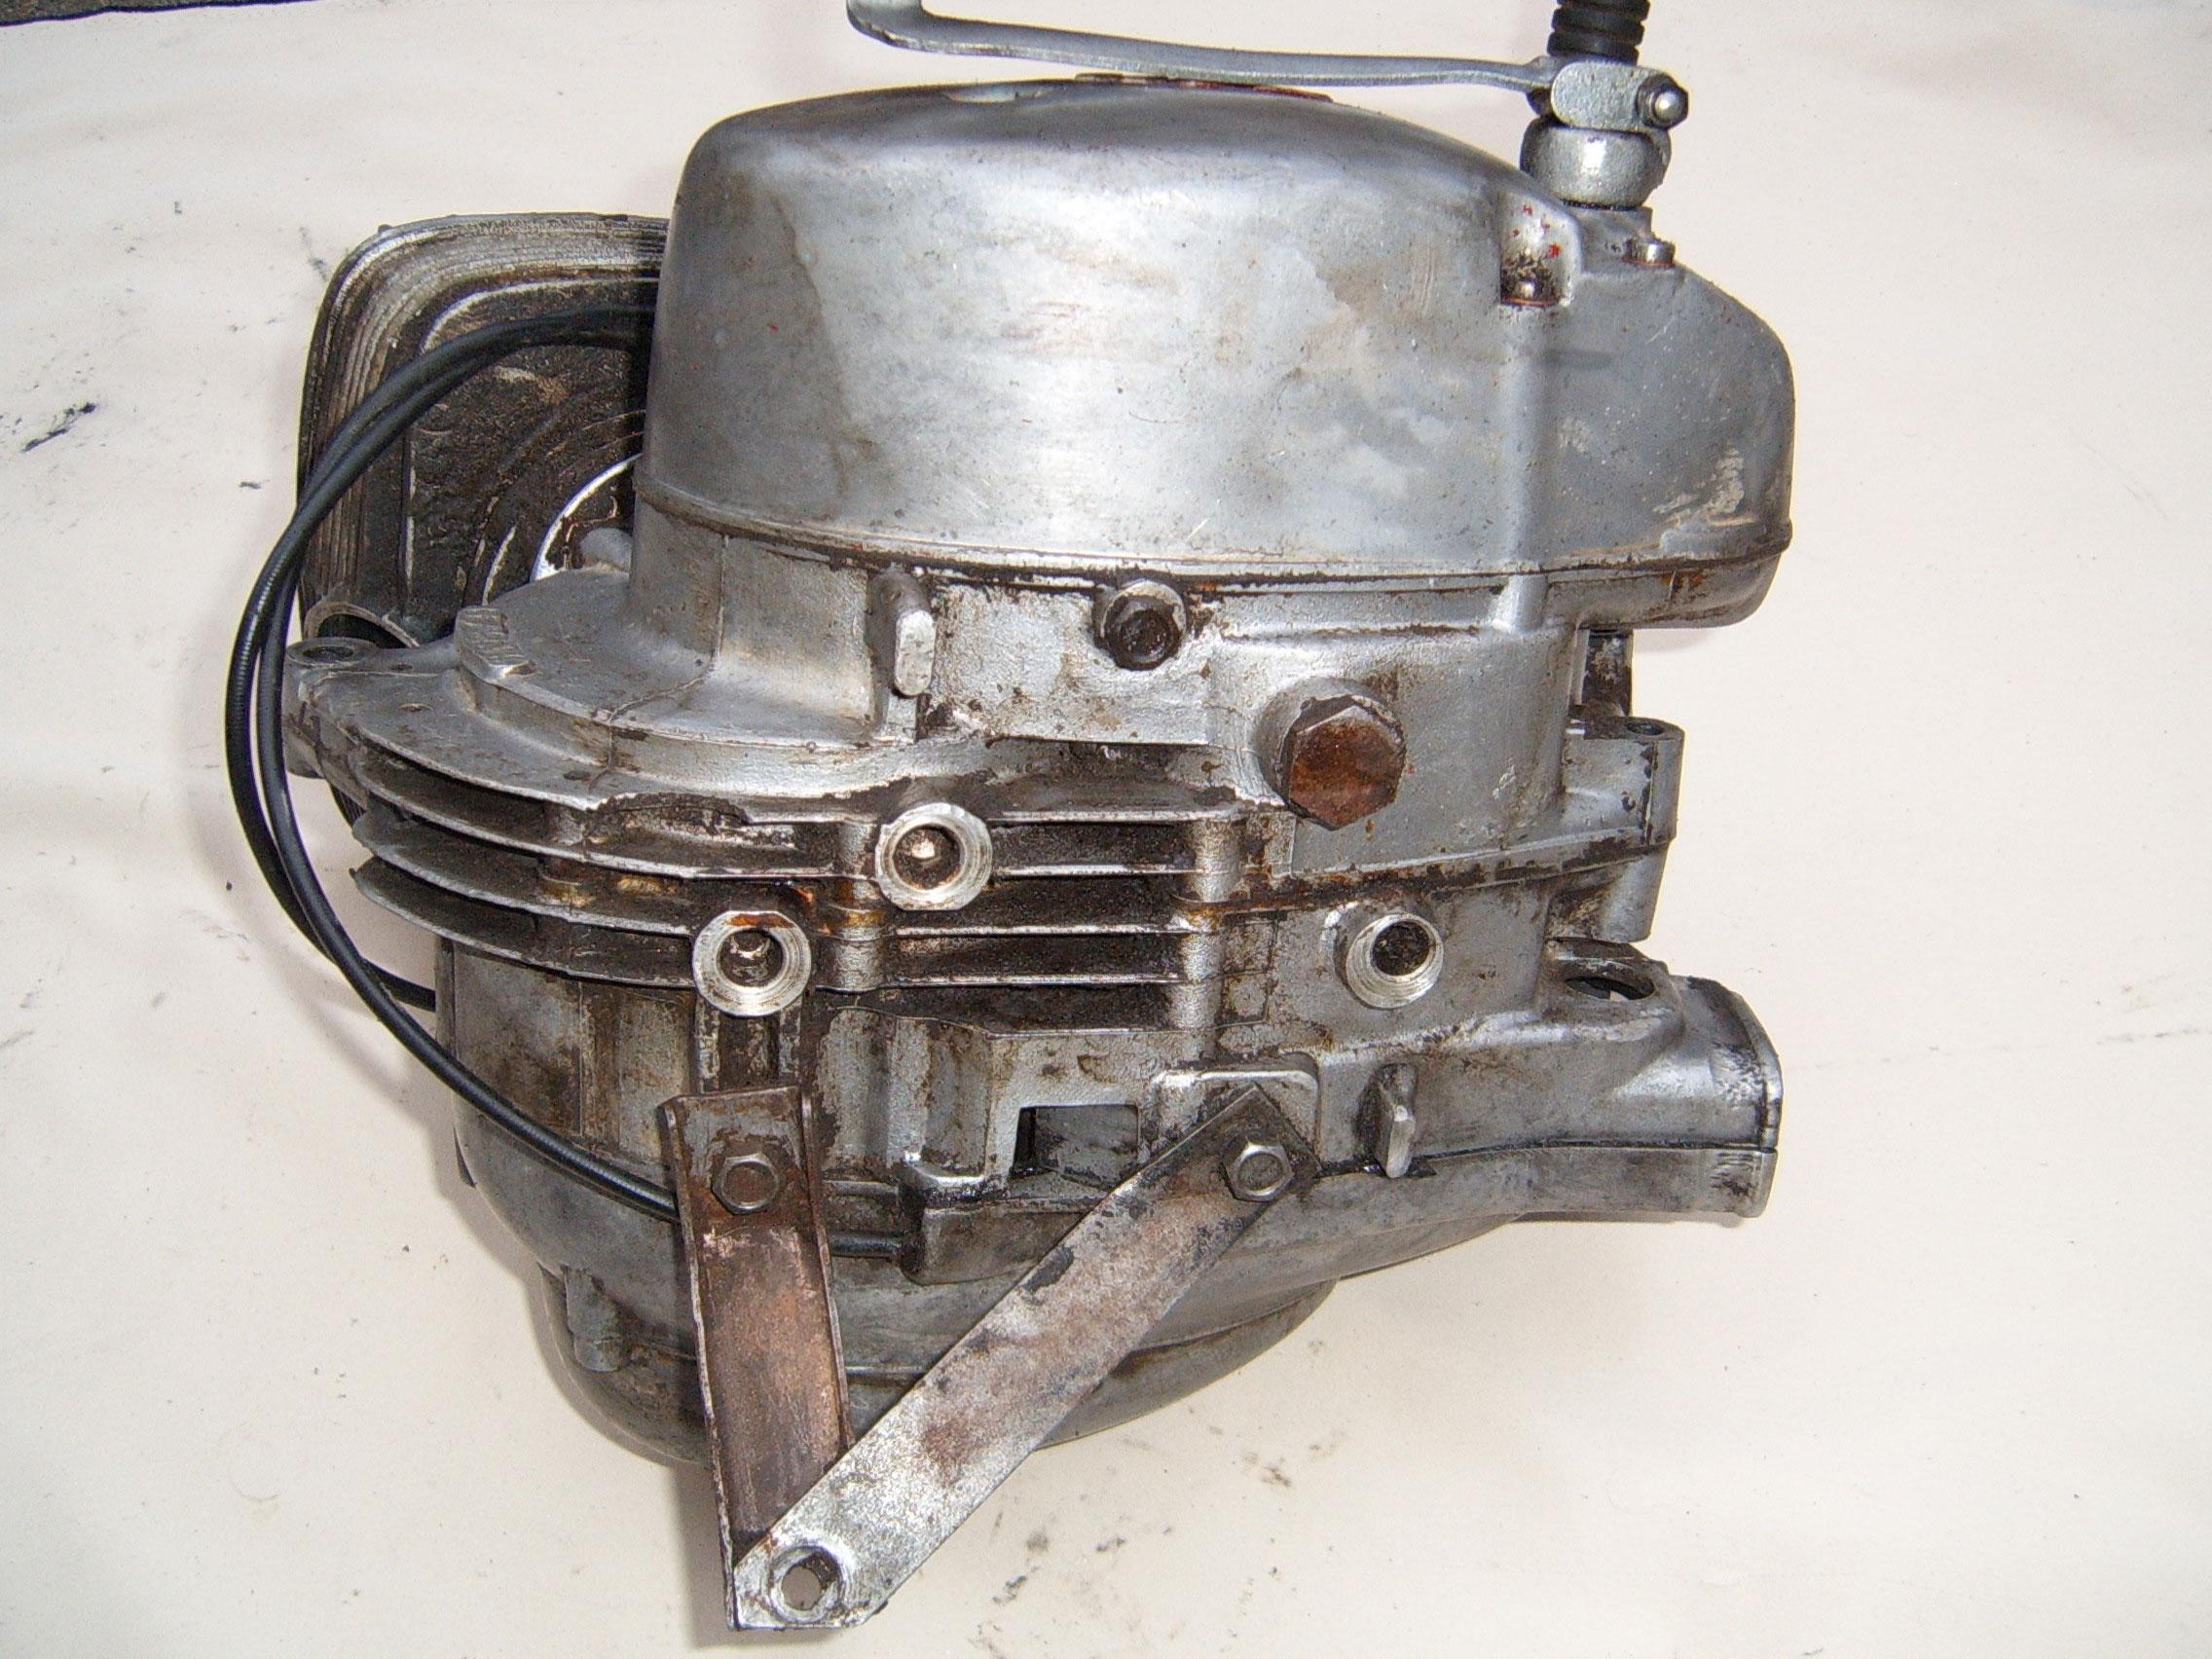 Motor MM 150/2 MZ ES 150/1 TS 150 - mz-es.de Ersatzteileshop